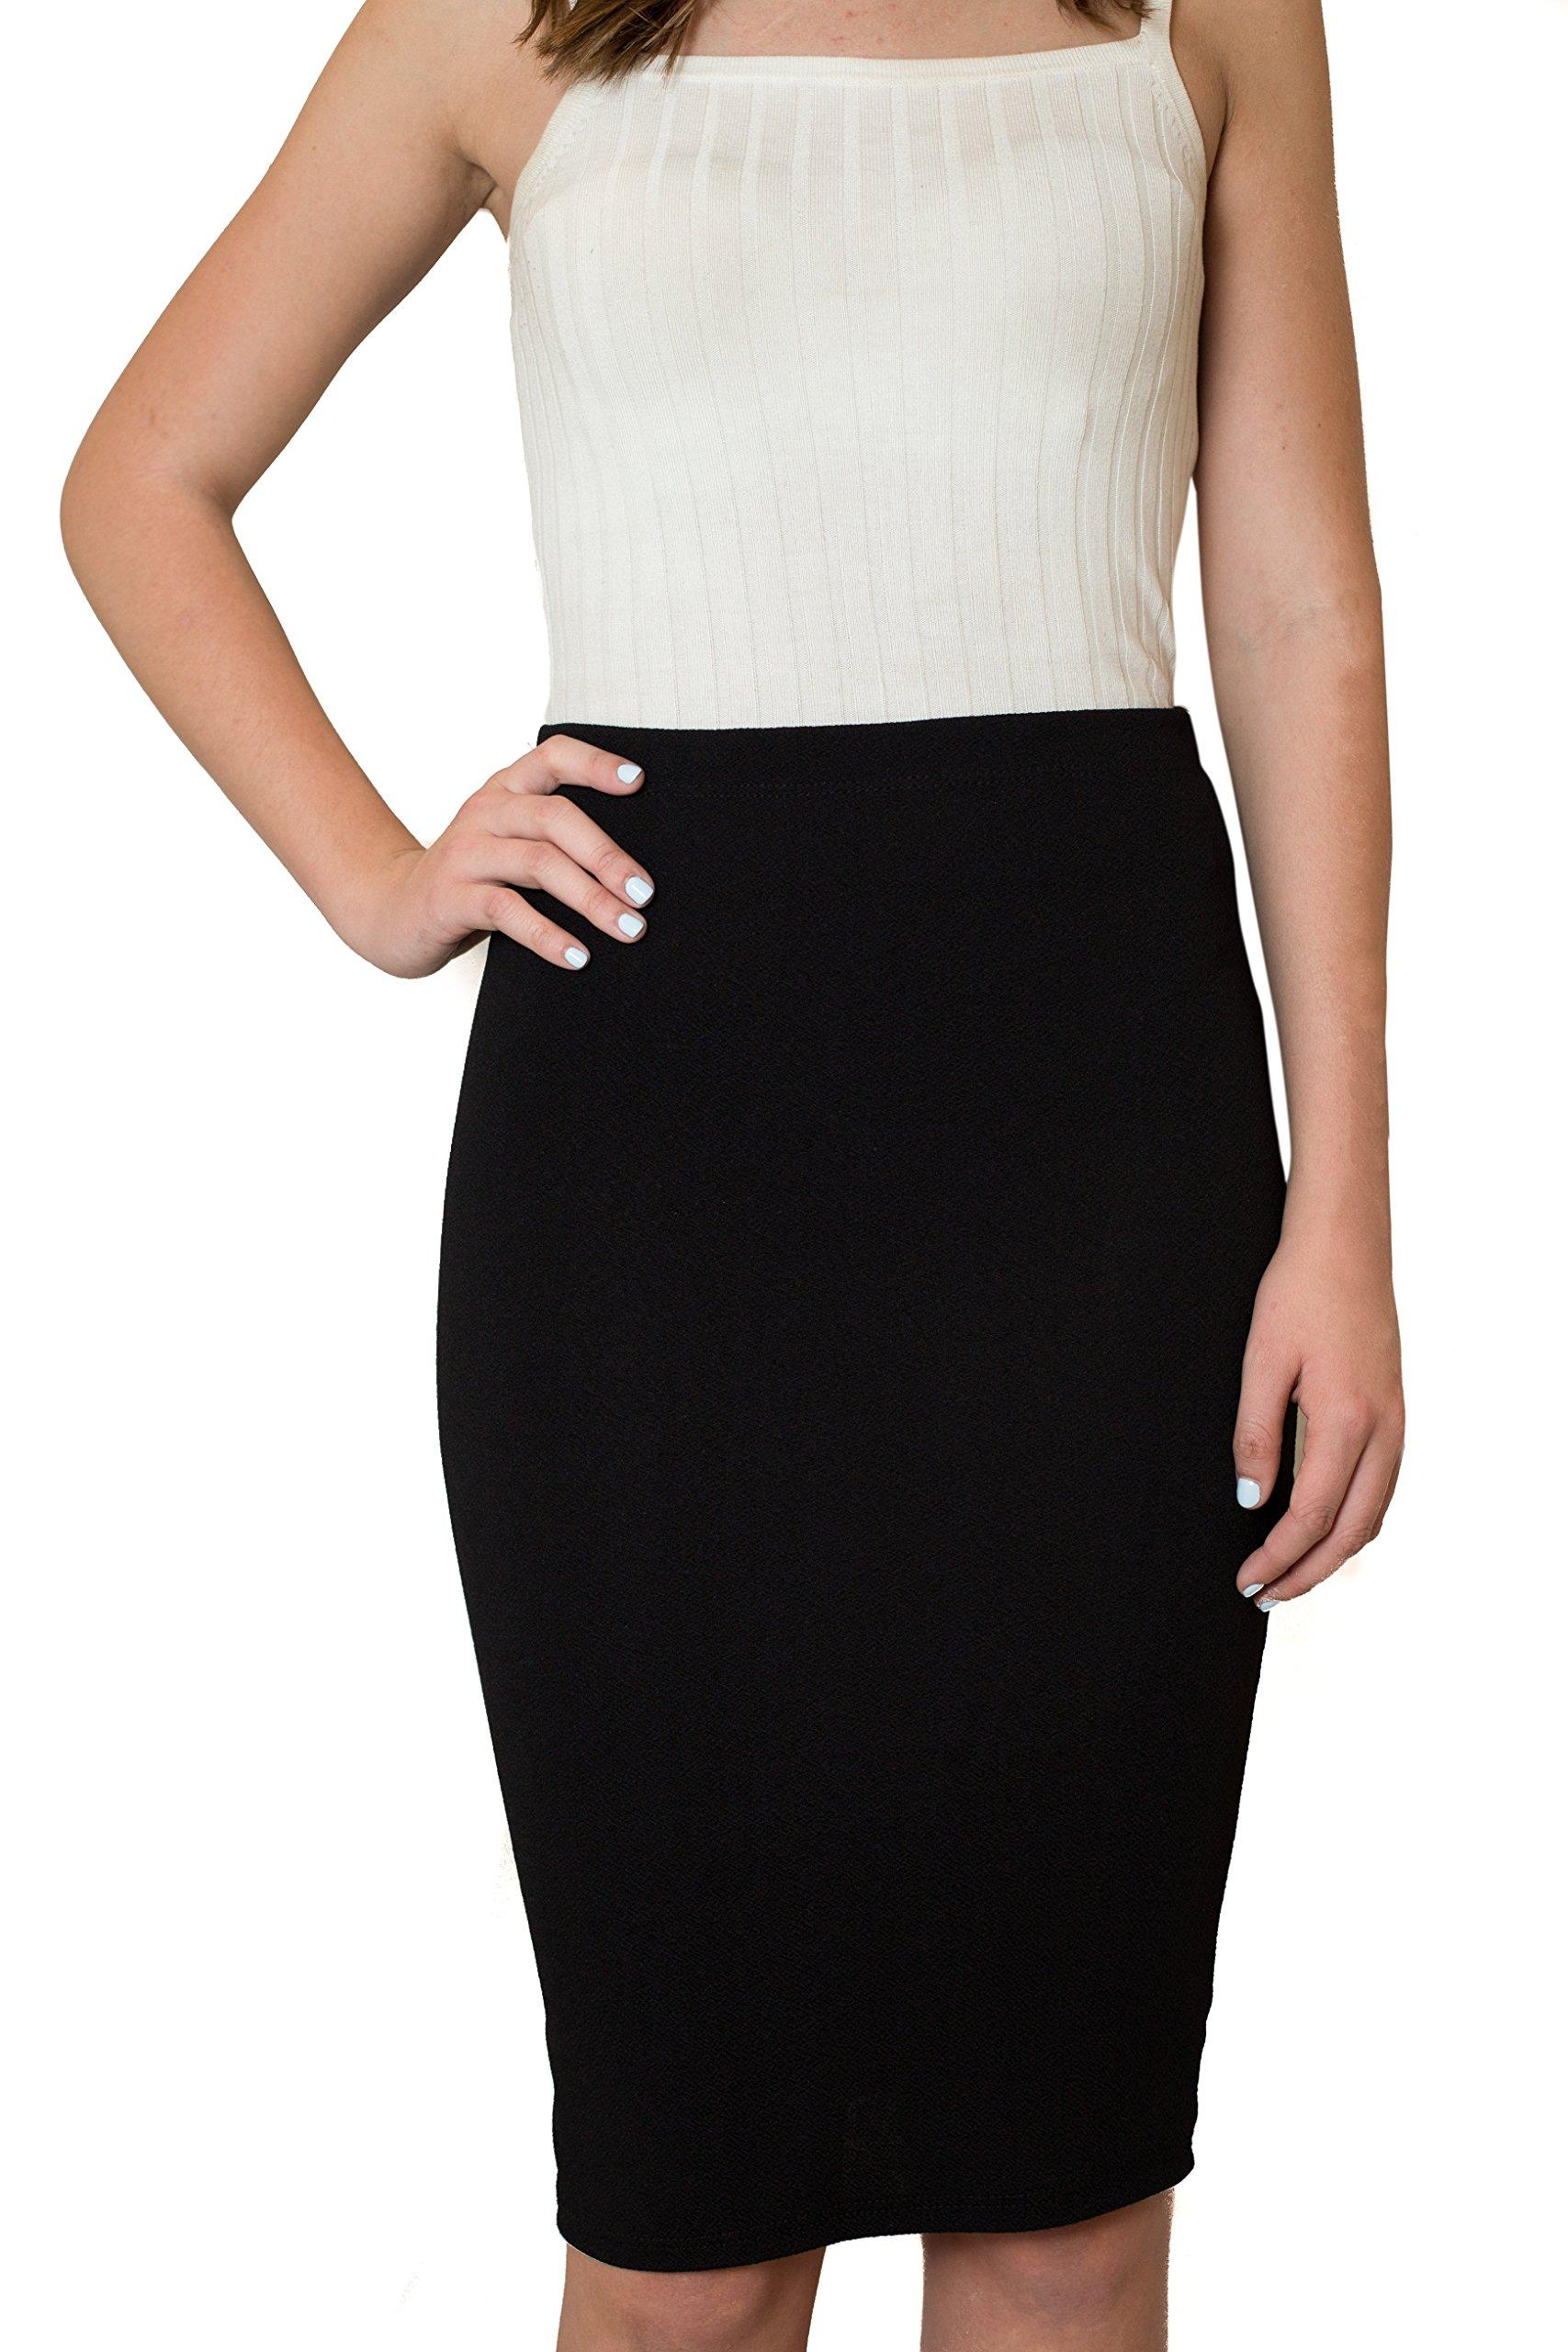 CALDORE USA High Waisted Midi Pencil Skirts - Women (Junior Ladies) Knee Length Dress Wear (Small, Black)